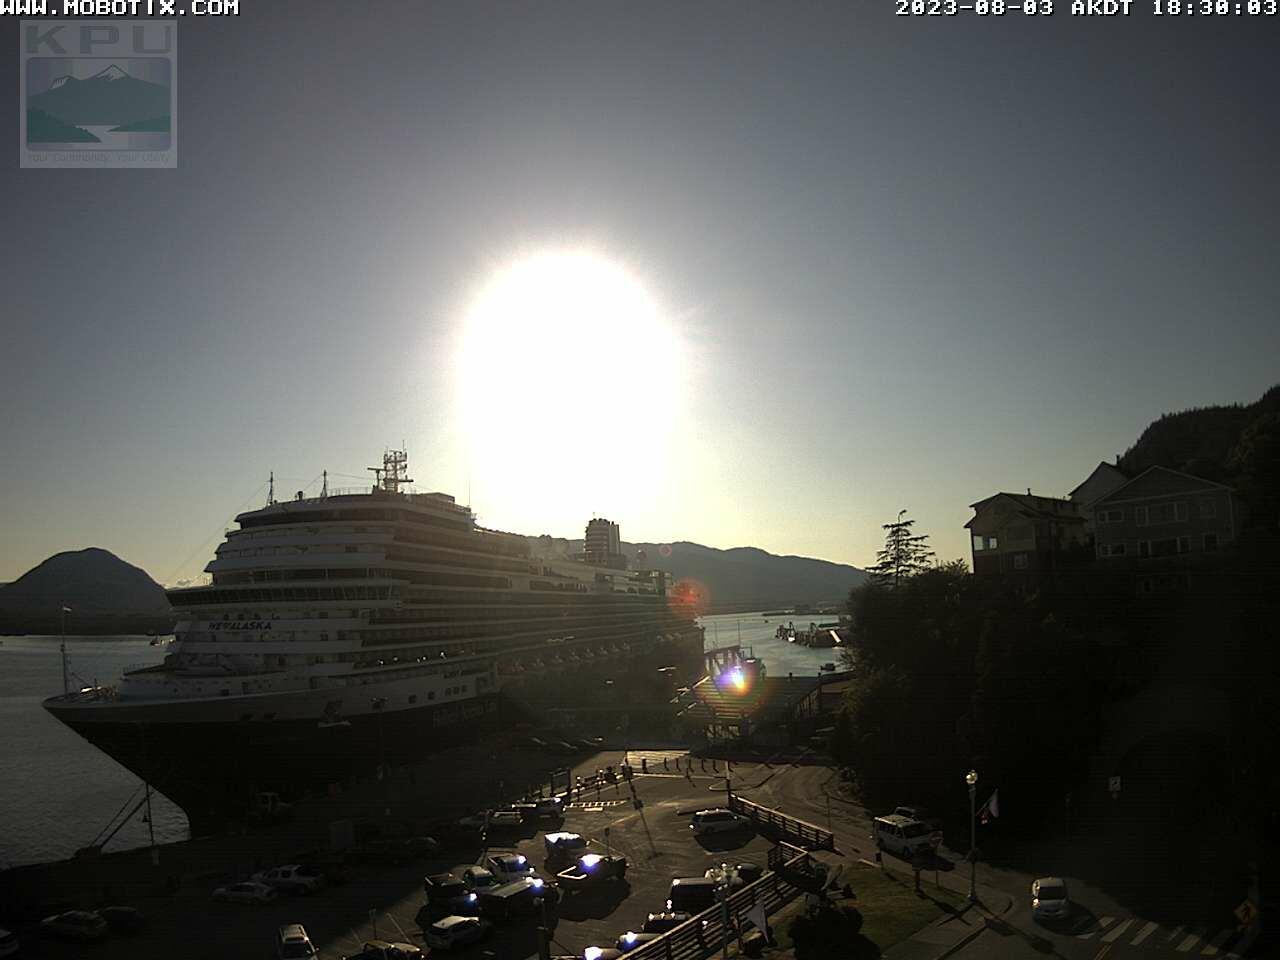 Current Ketchikan Webcam #2 Alaska-sized Image